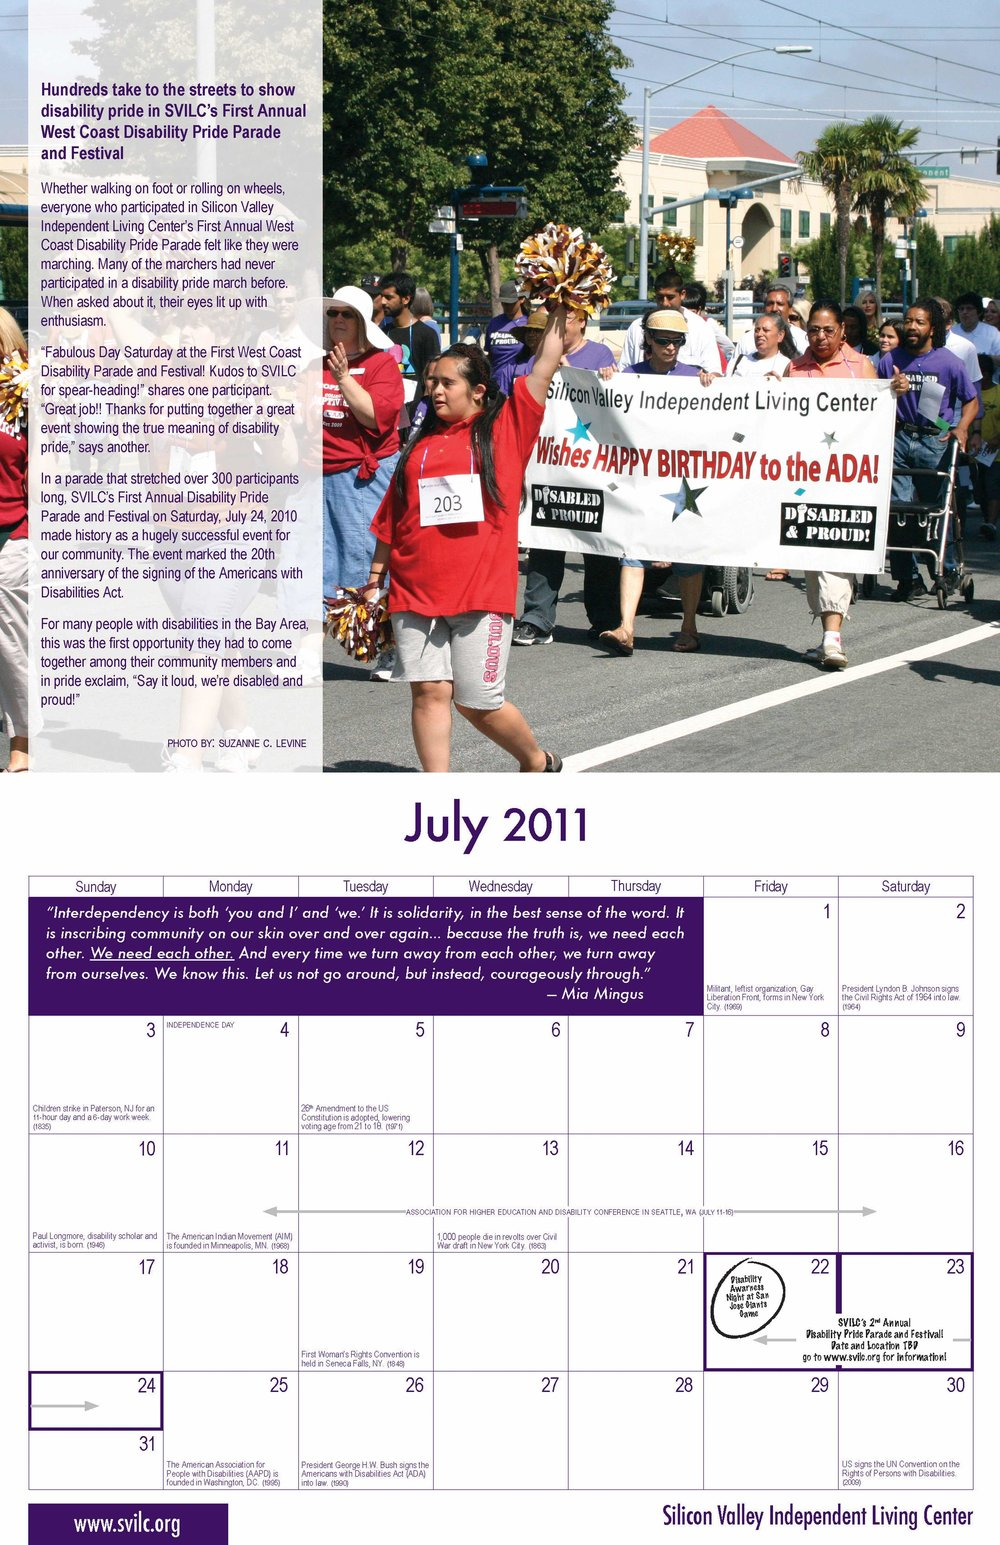 SVILC 2011 Calendar  July spread